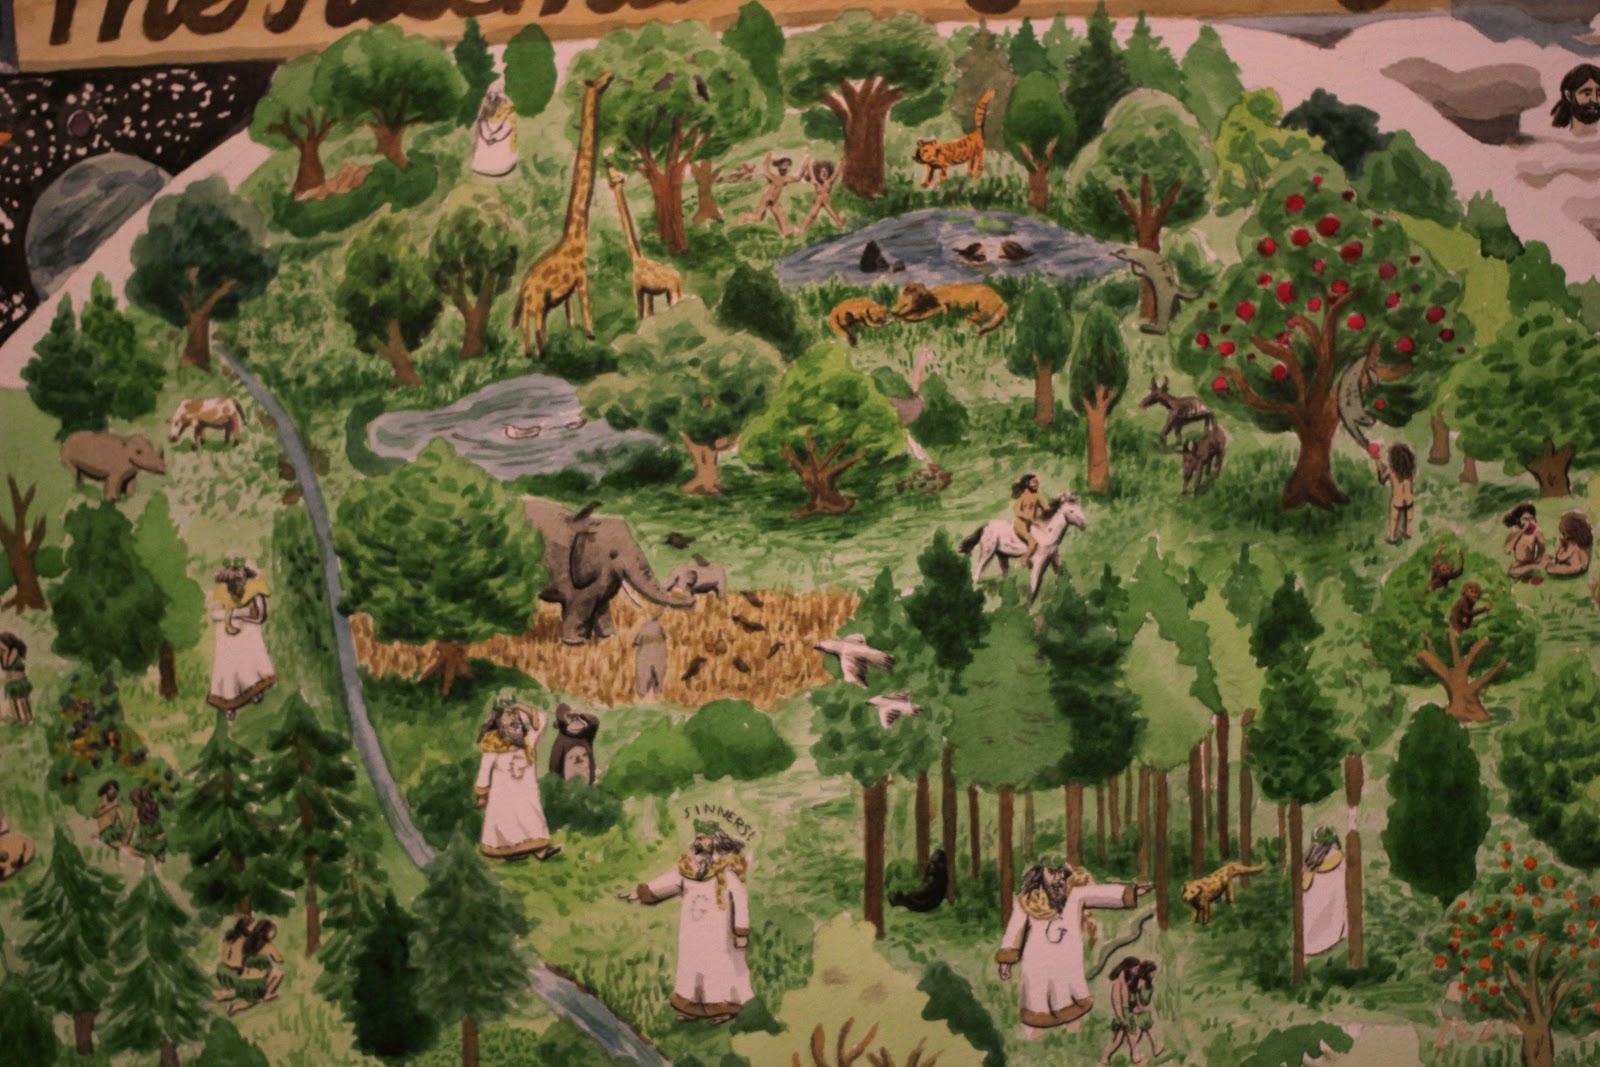 Jazz Greenhill Illustration The Garden Of Eden Map